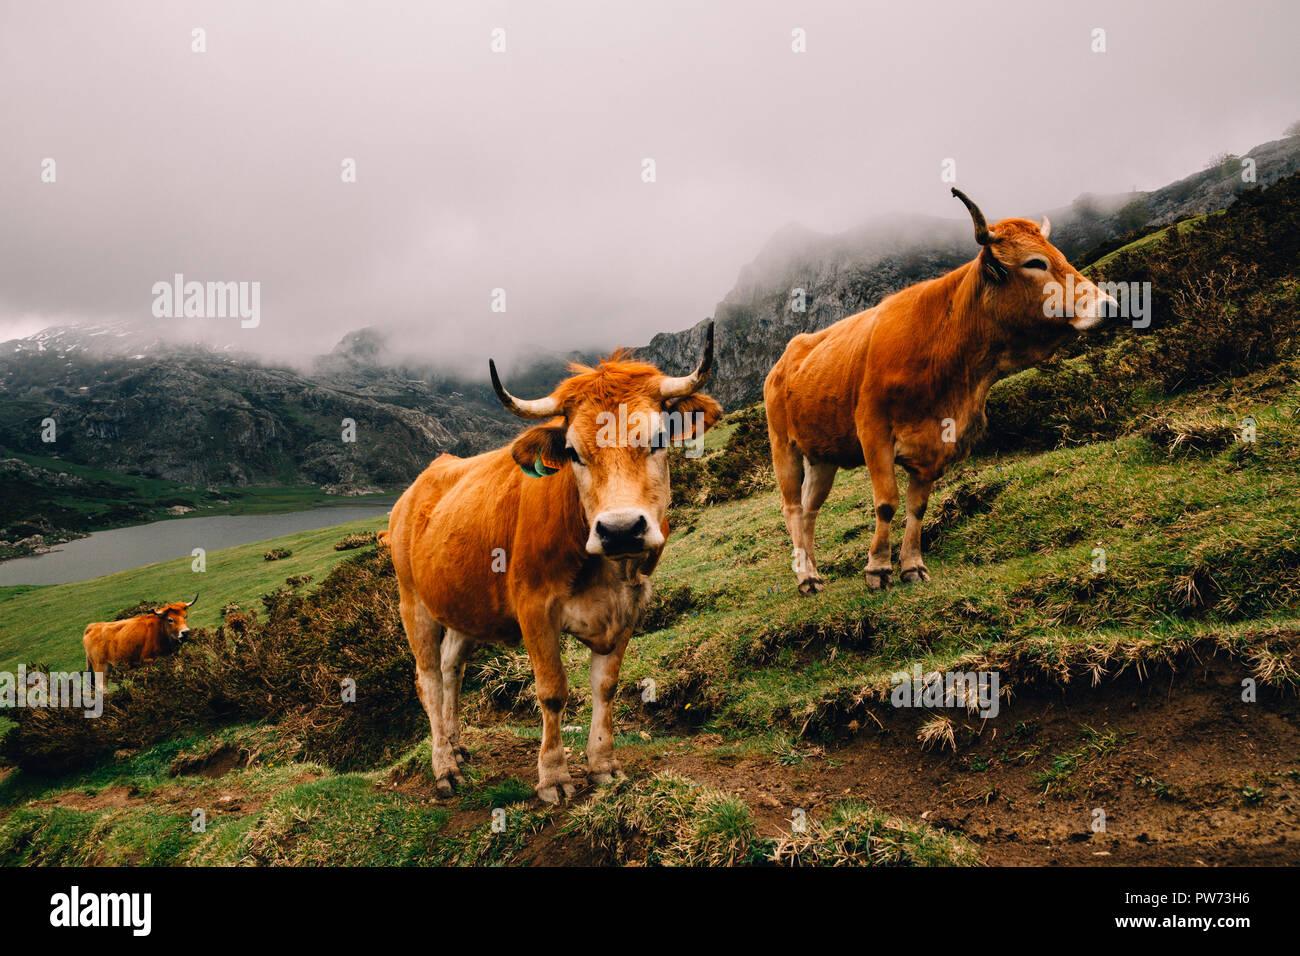 Ox, Picos de Europa Nationalpark, Asturien, Spanien, 2018 Stockbild